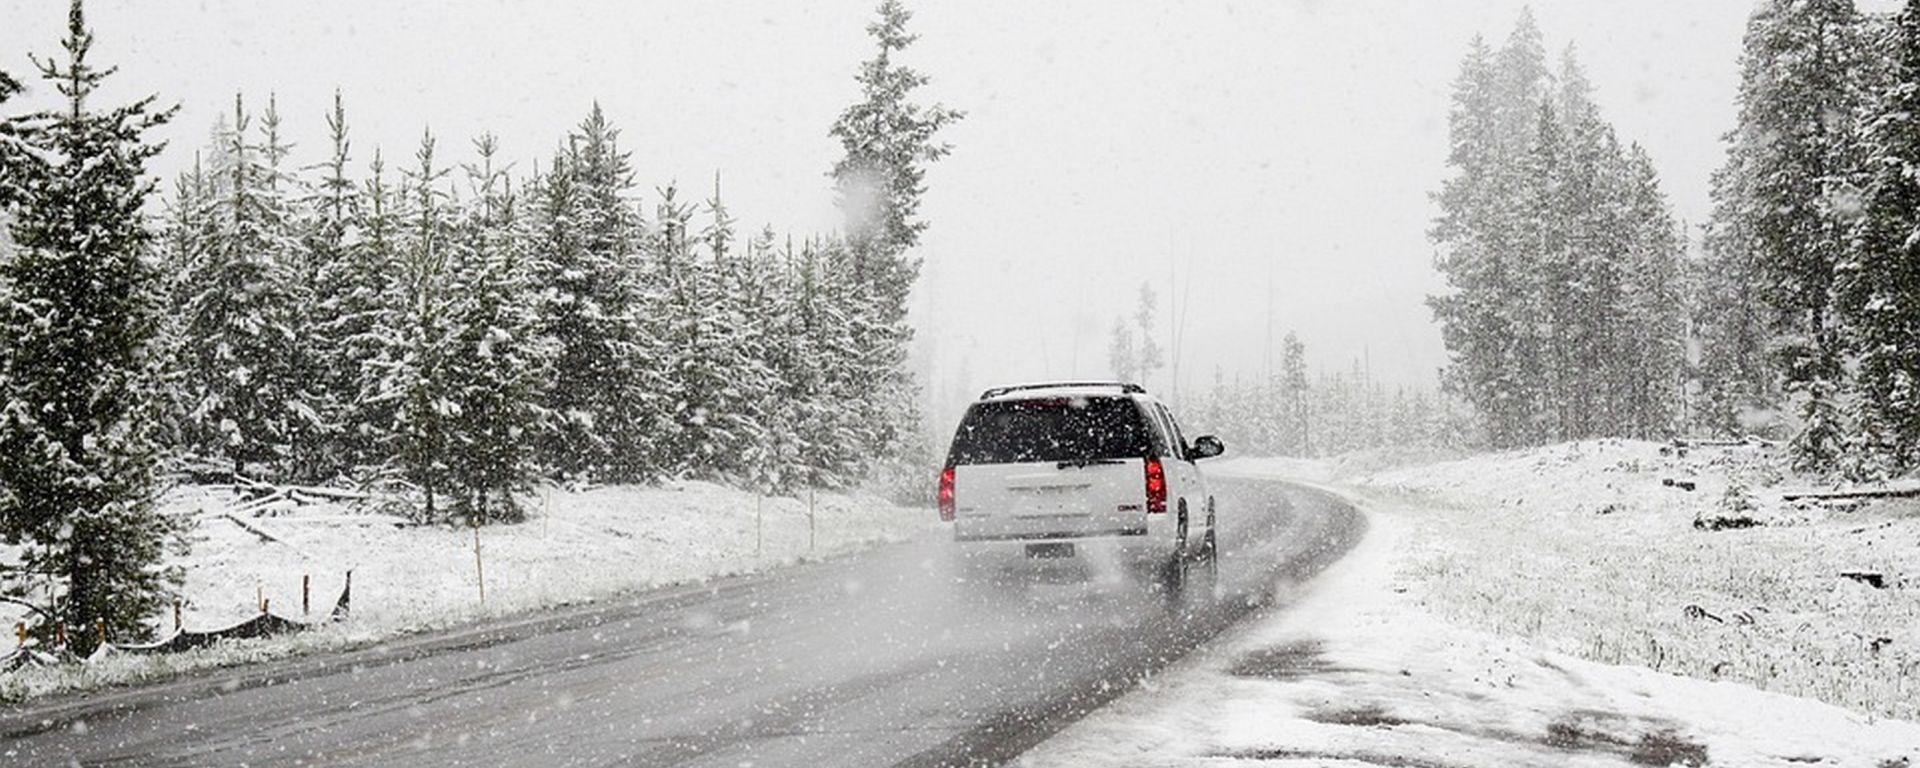 Nokian: 4 new entry nella gamma di pneumatici invernali